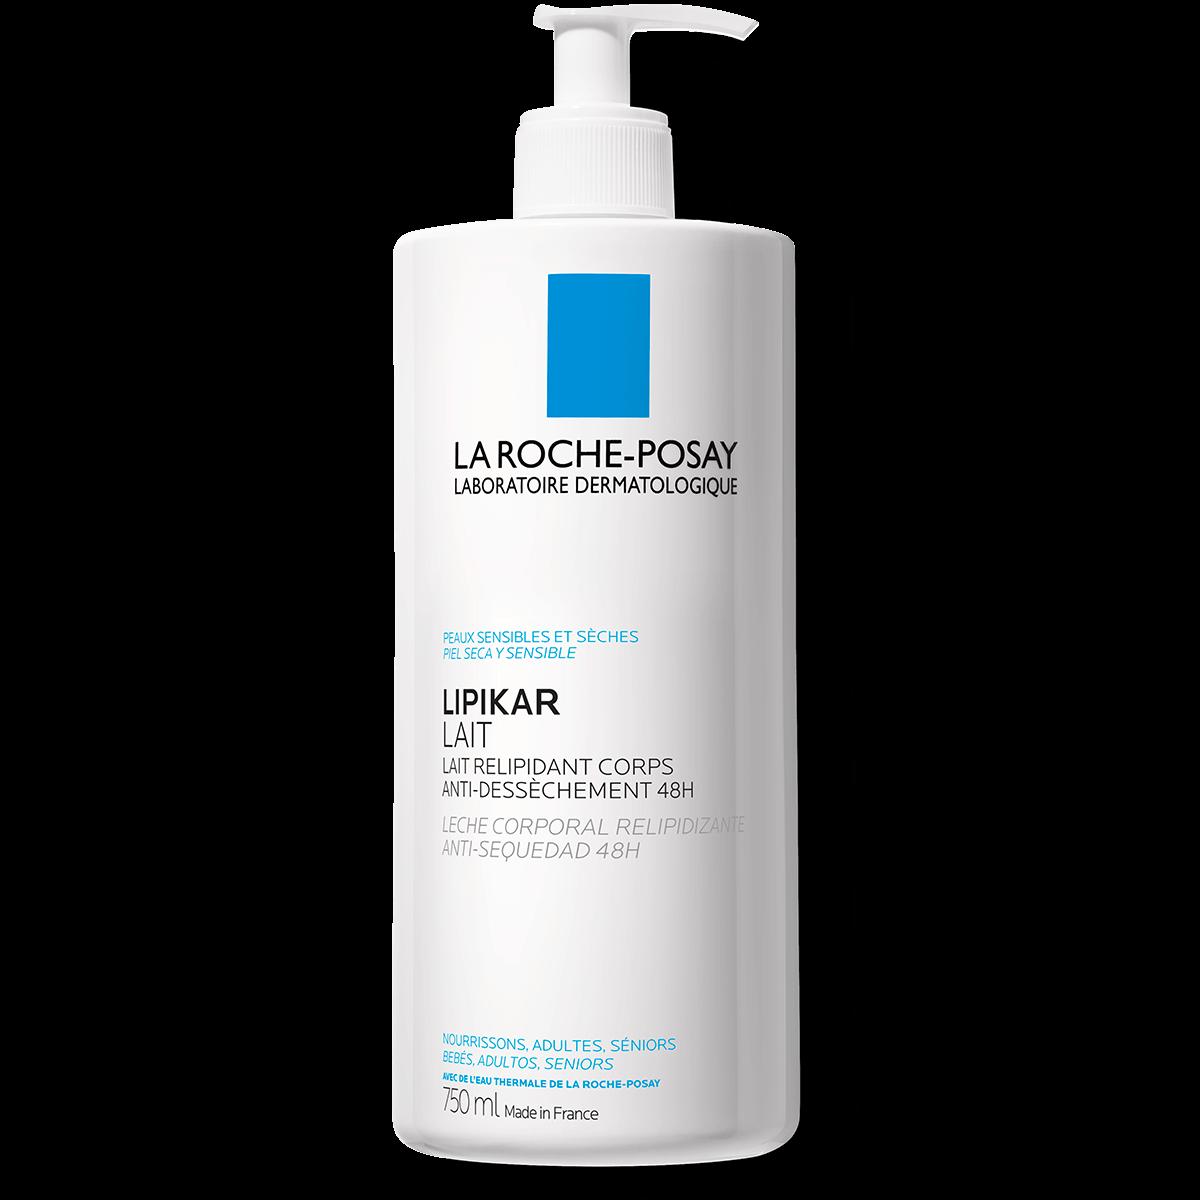 La Roche Posay Body Care Lipikar Lait 750ml 3337875549608 Front